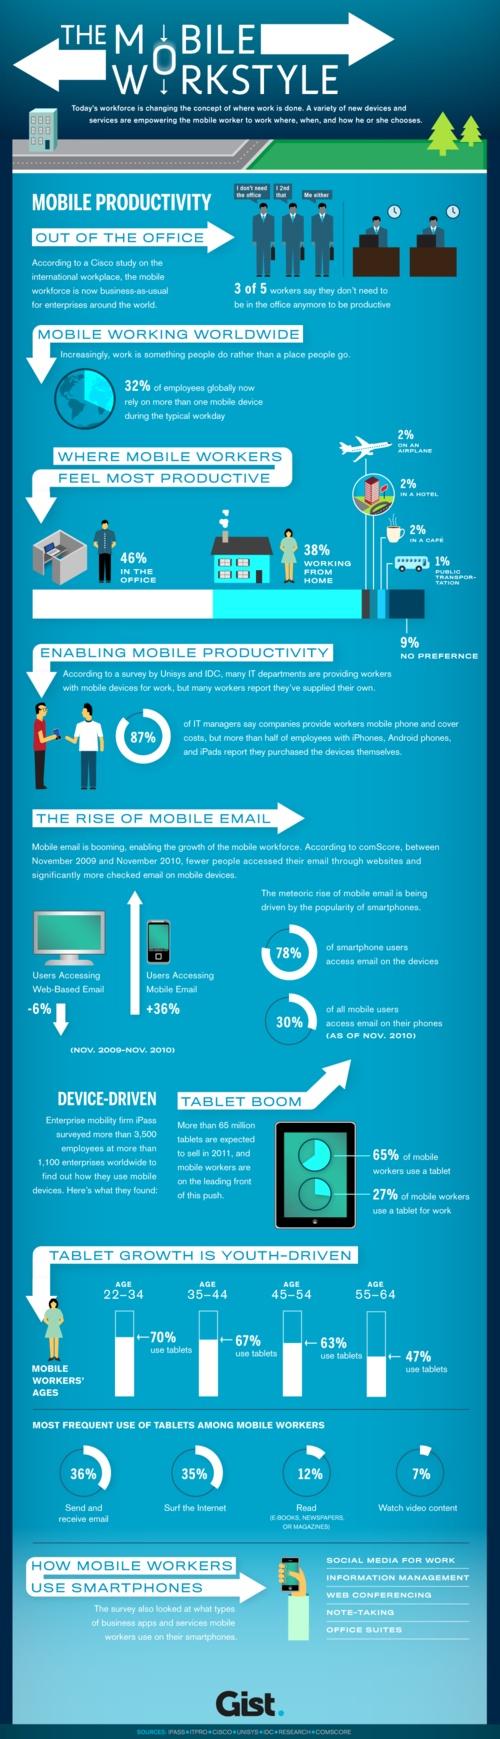 Mobile use for work: Mobile Workforc, Website, Web Site, Mobiles Workstyl, Social Media, Workstyl Mobiles, Mobiles Workers, Mobiles Infographic, Mobiles Marketing